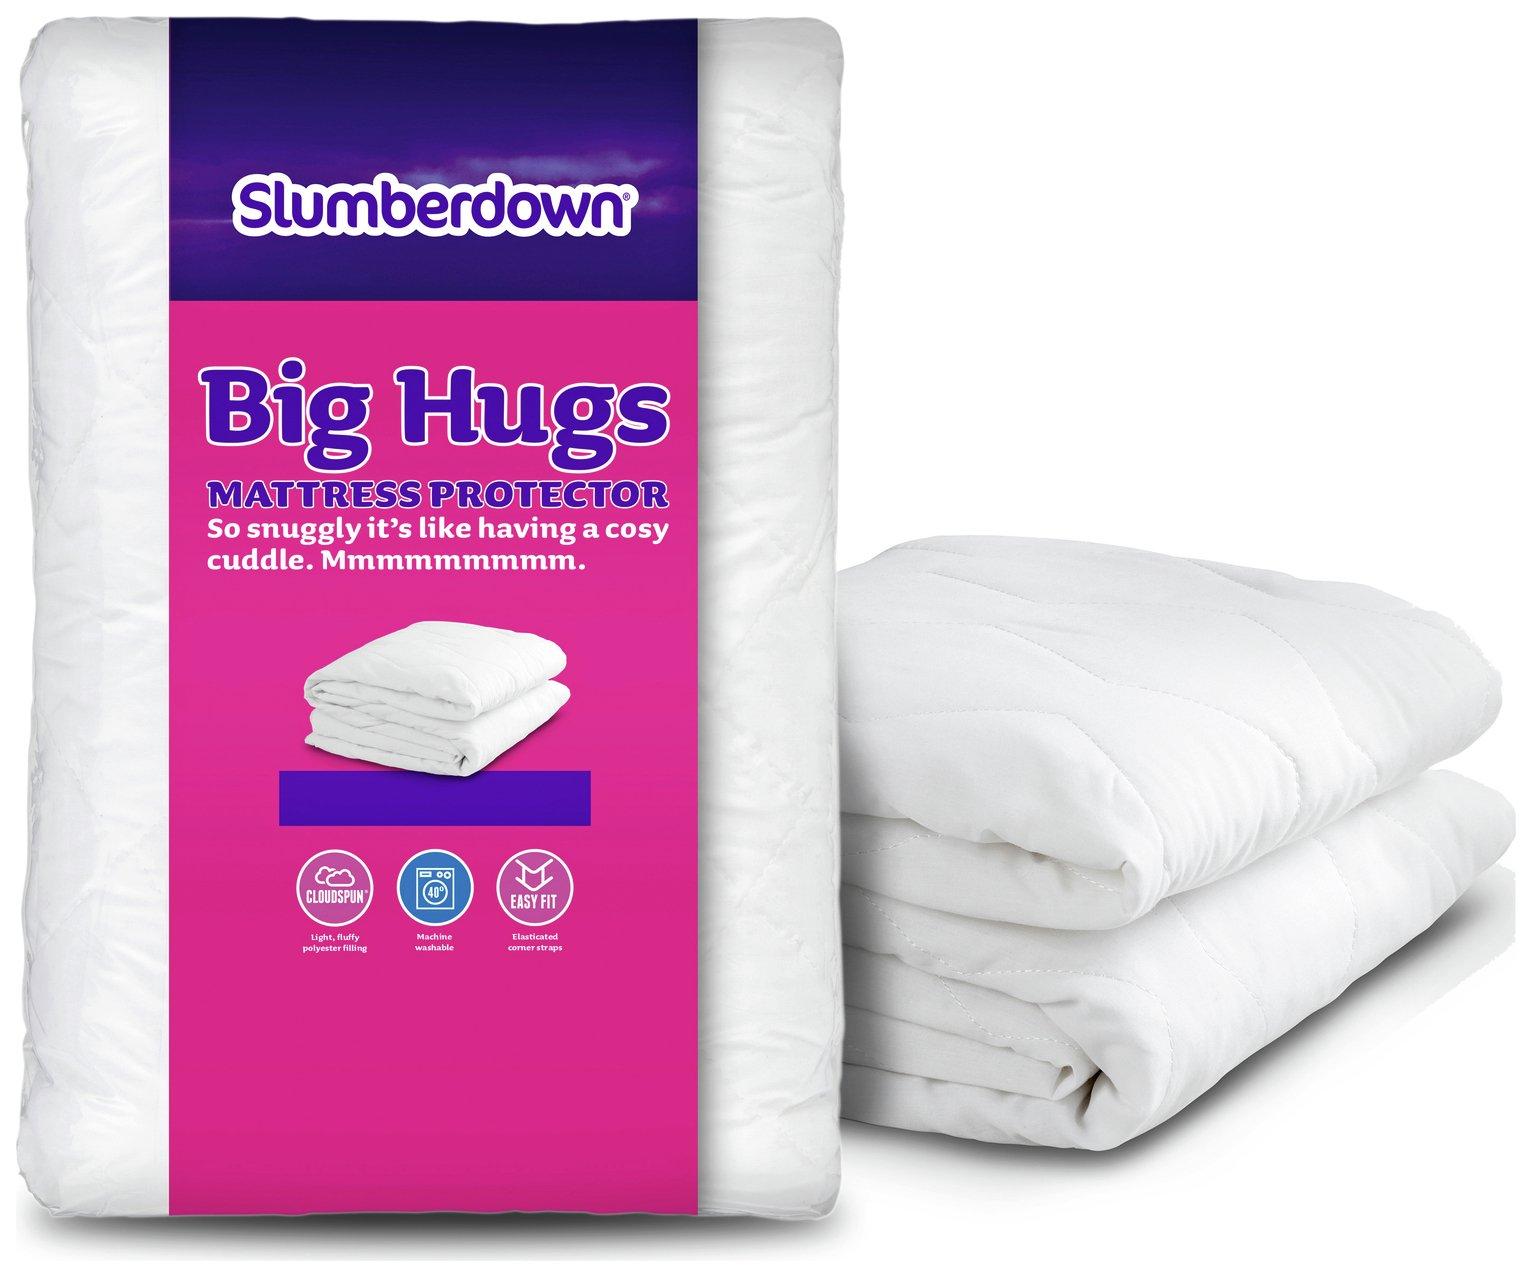 slumberdown  big hugs  mattress protector  kingsize